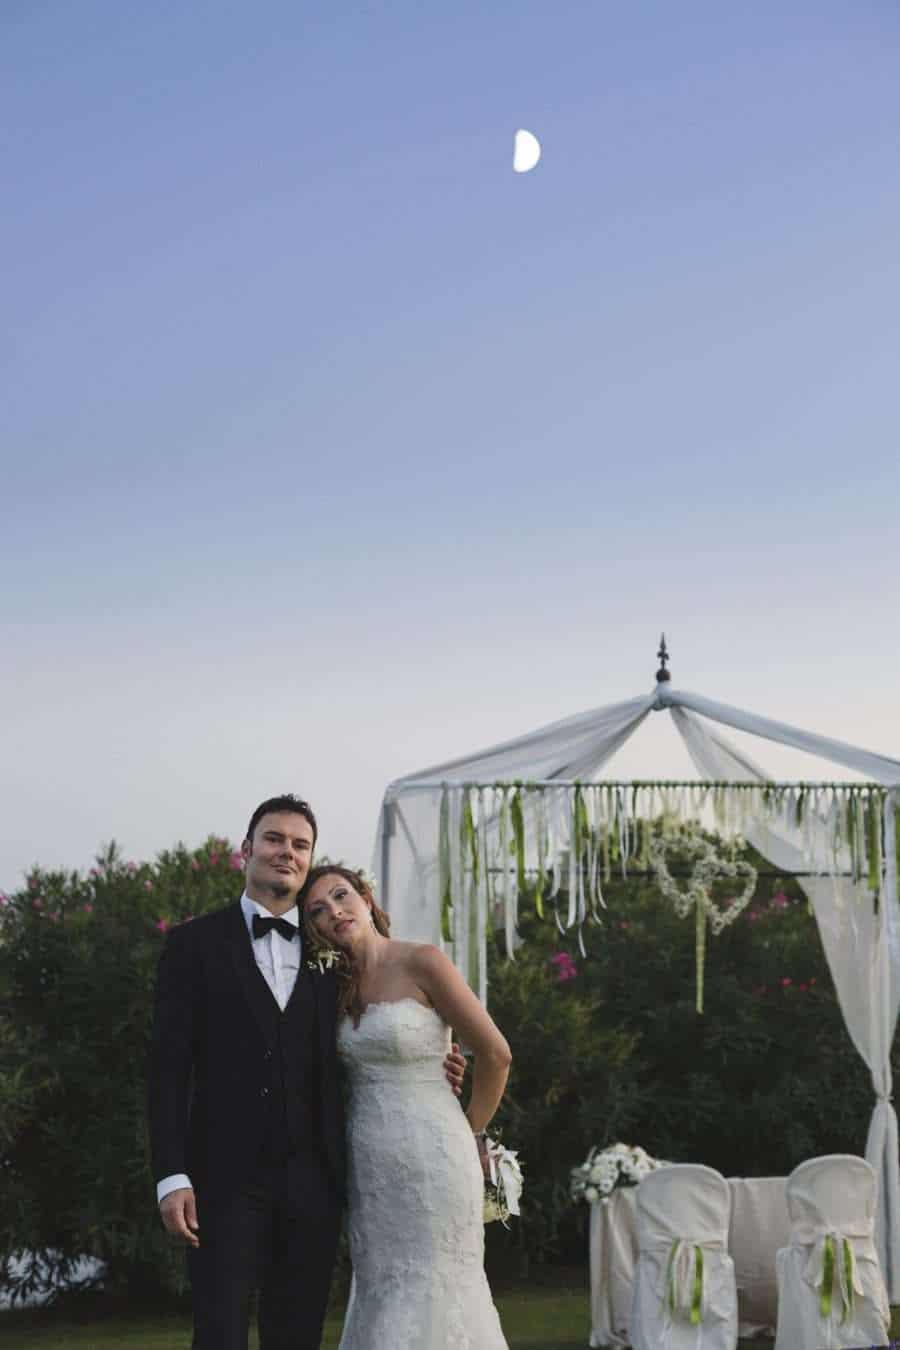 Outdoors Indoors wedding - Bride and Groom